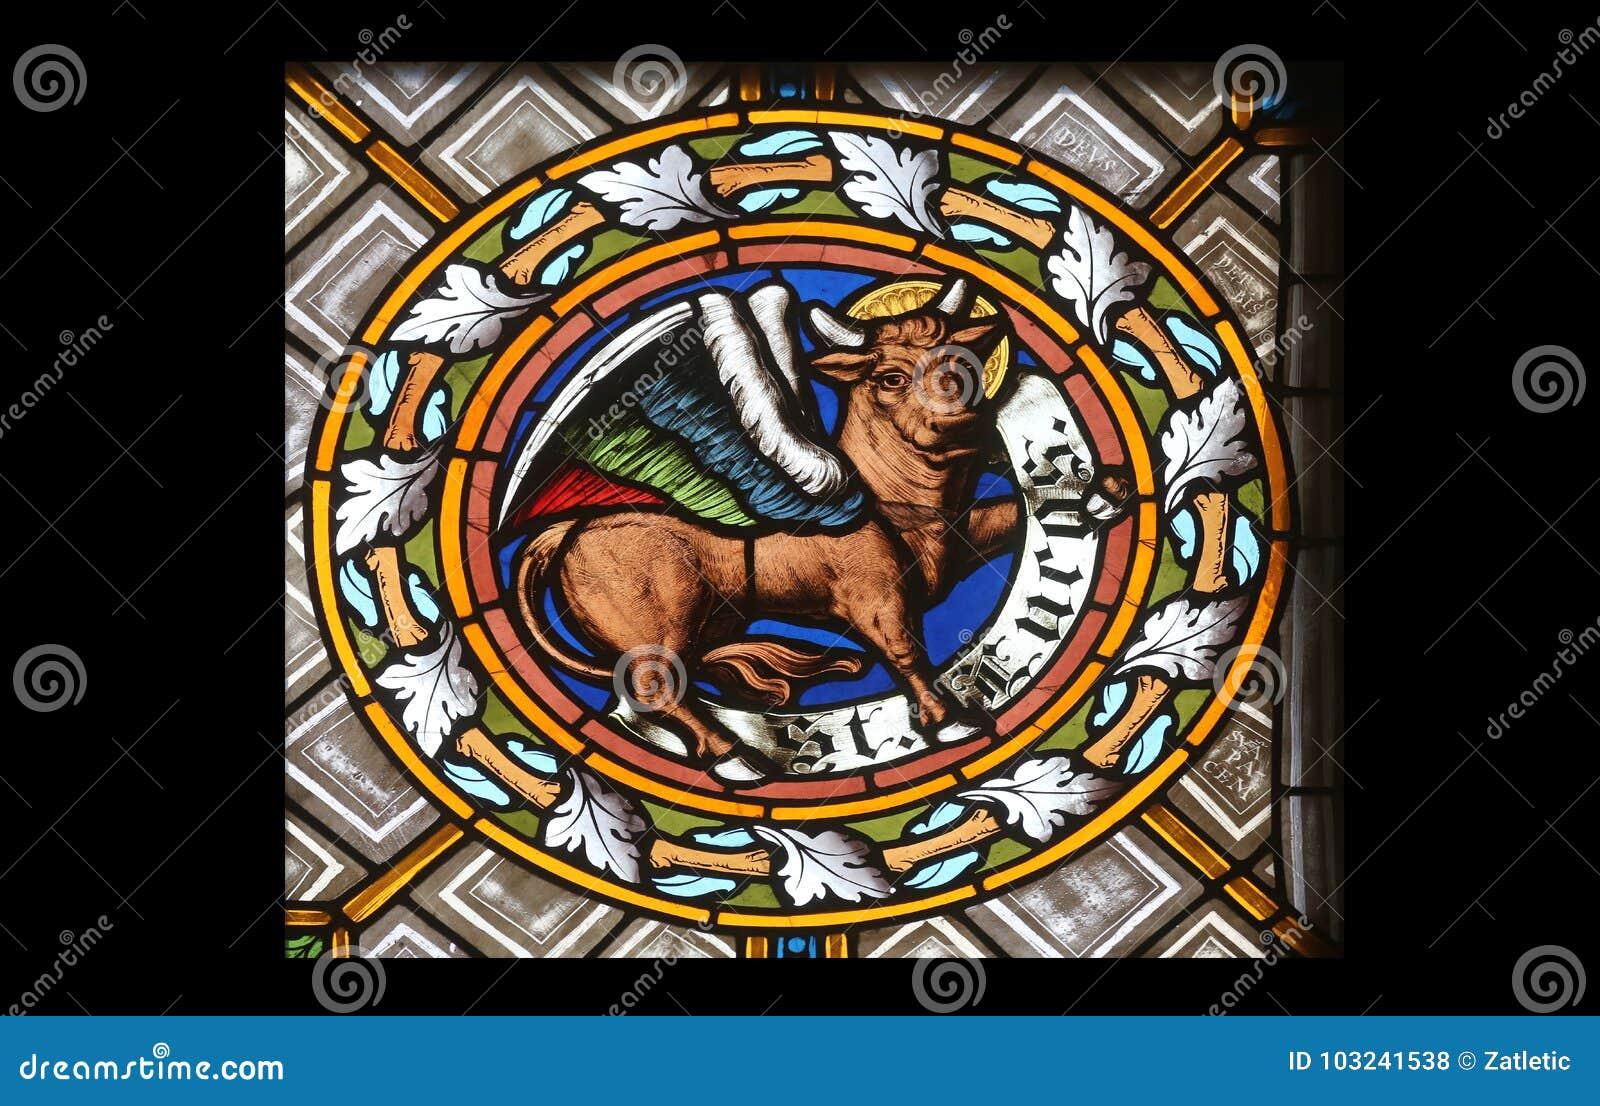 Symbol Of The Saint Luke The Evangelist Stock Photo Image Of Glass